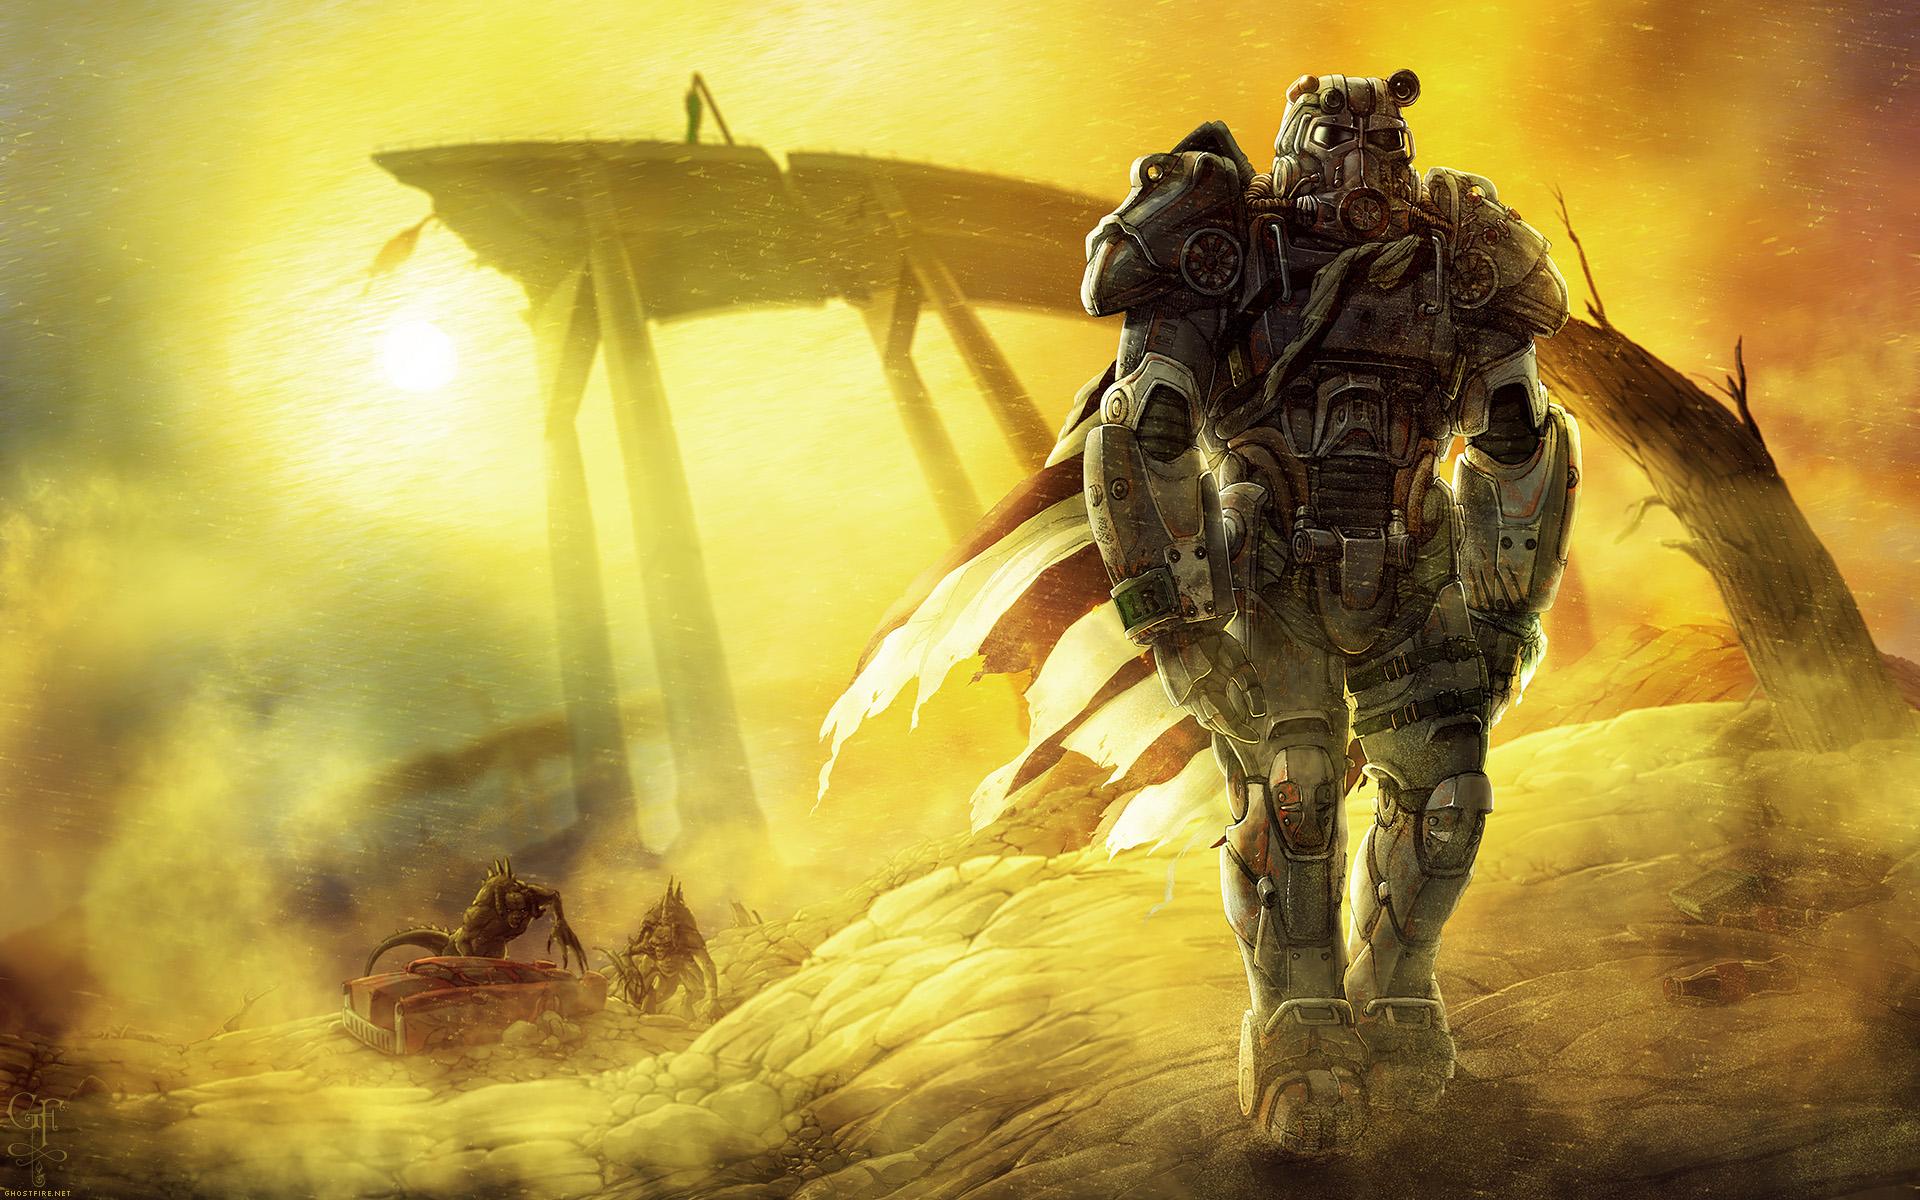 Fallout 4 Wallpaper HD - WallpaperSafari